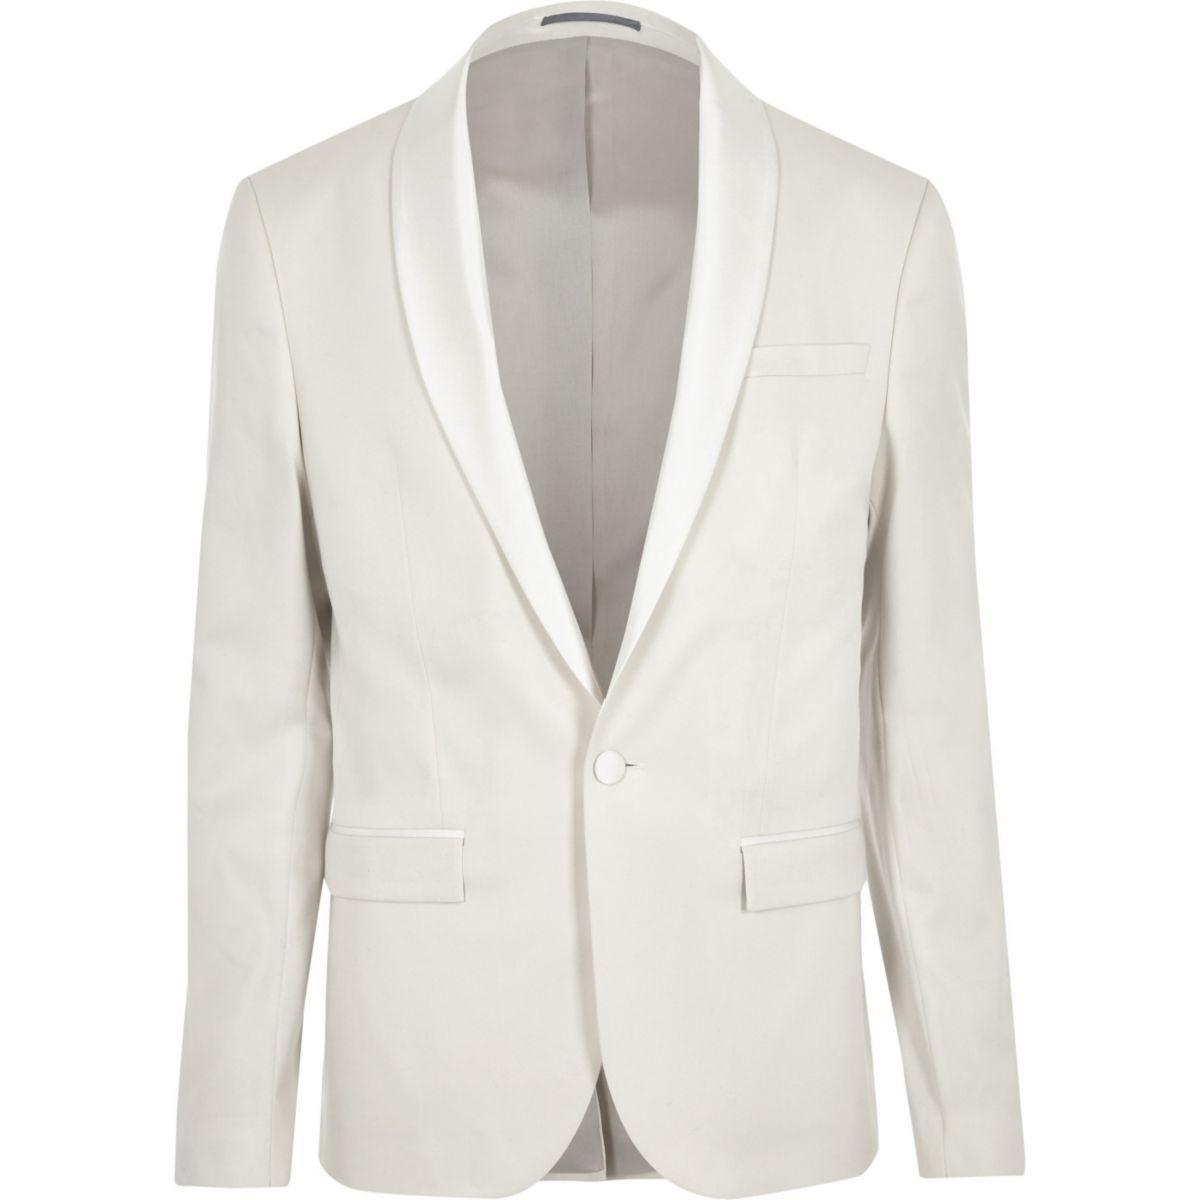 Cream skinny fit suit jacket